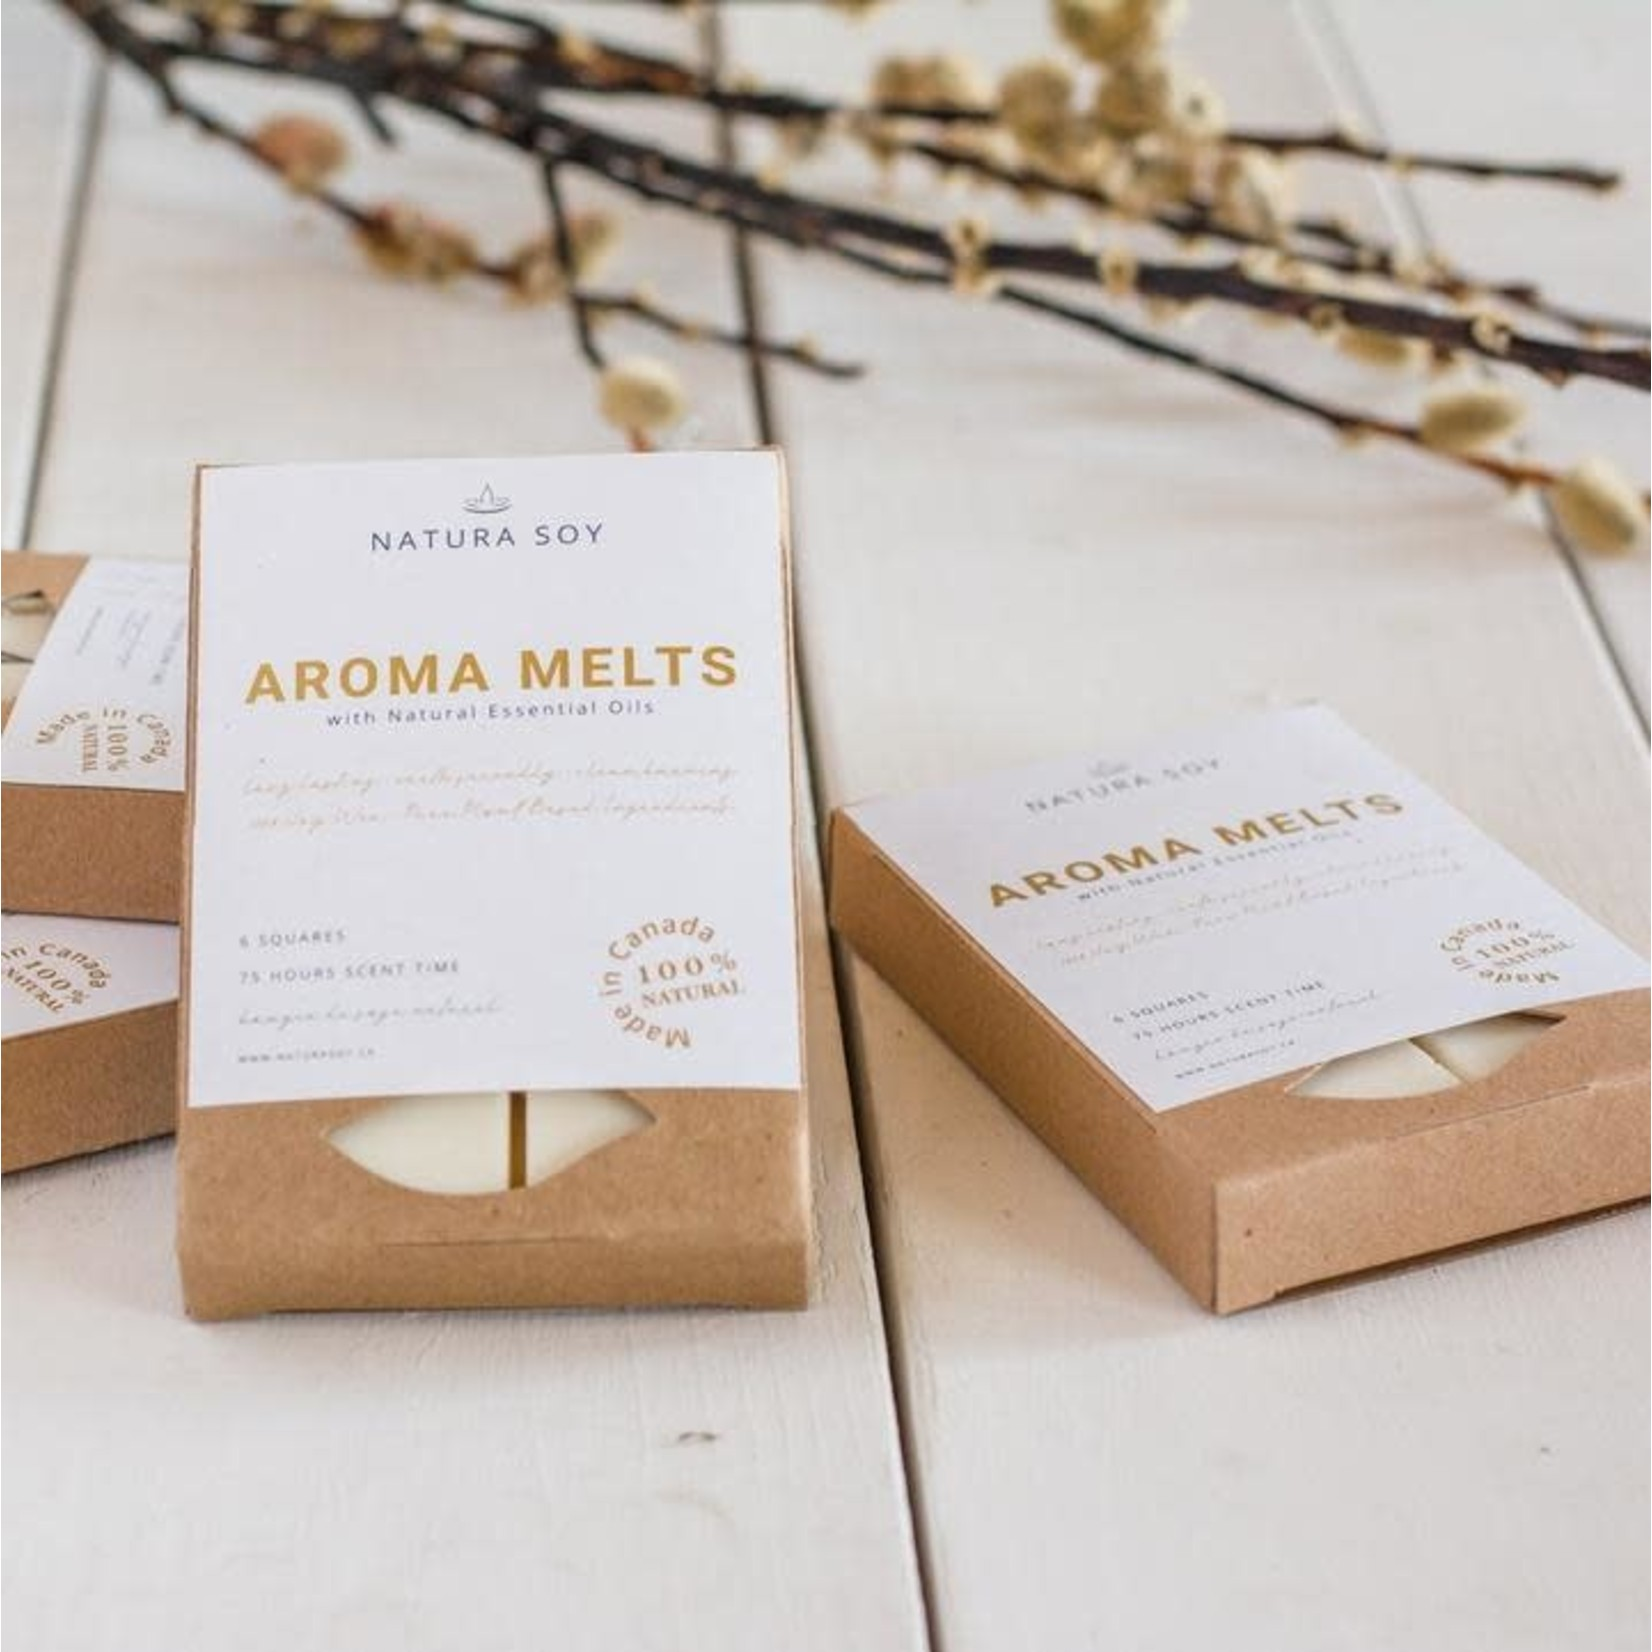 NATURA SOY Aroma Melts Vanilla Maple Latte